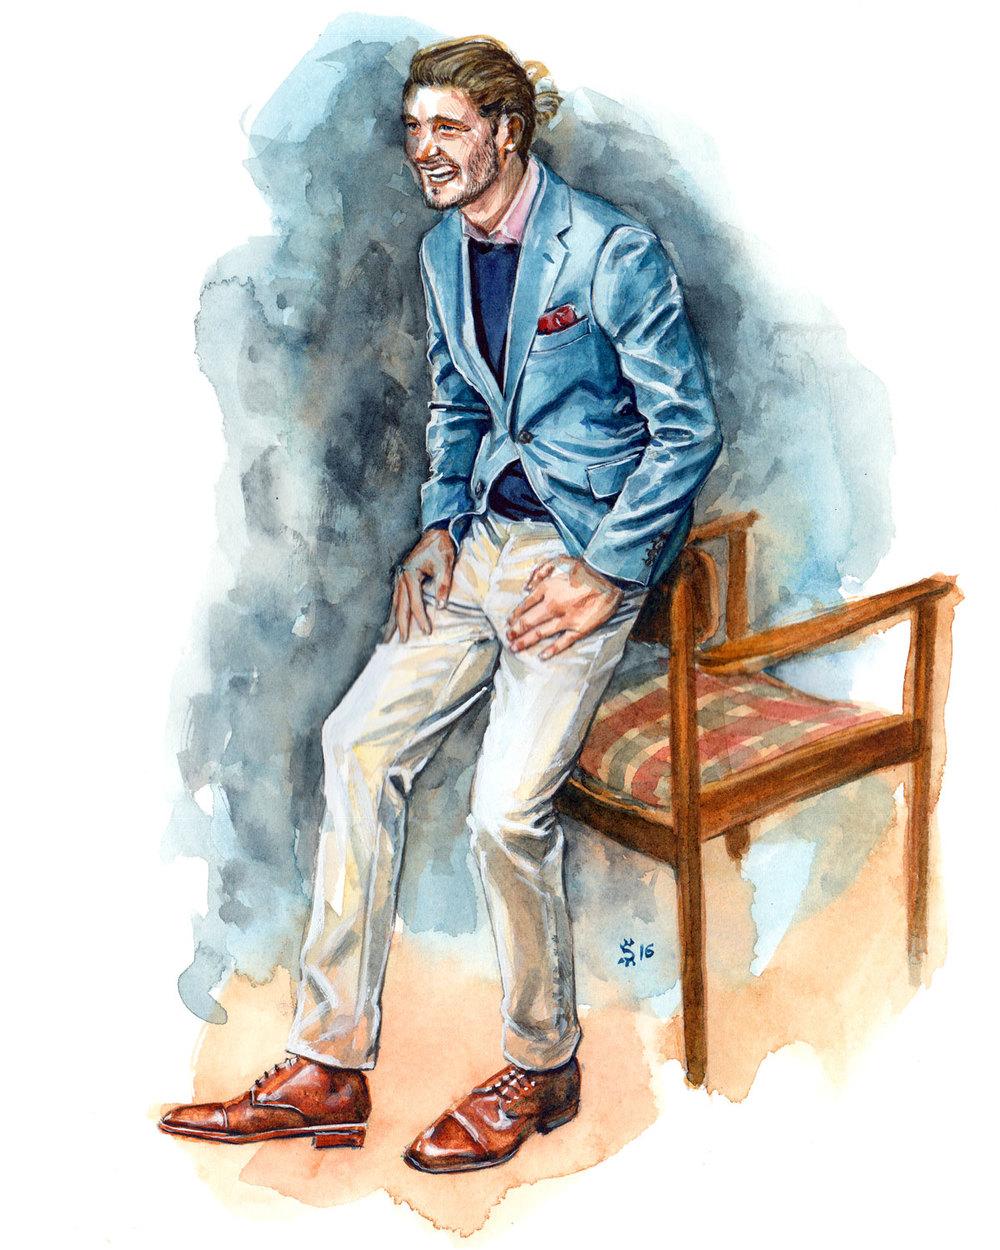 MJ Bale fashion illustration